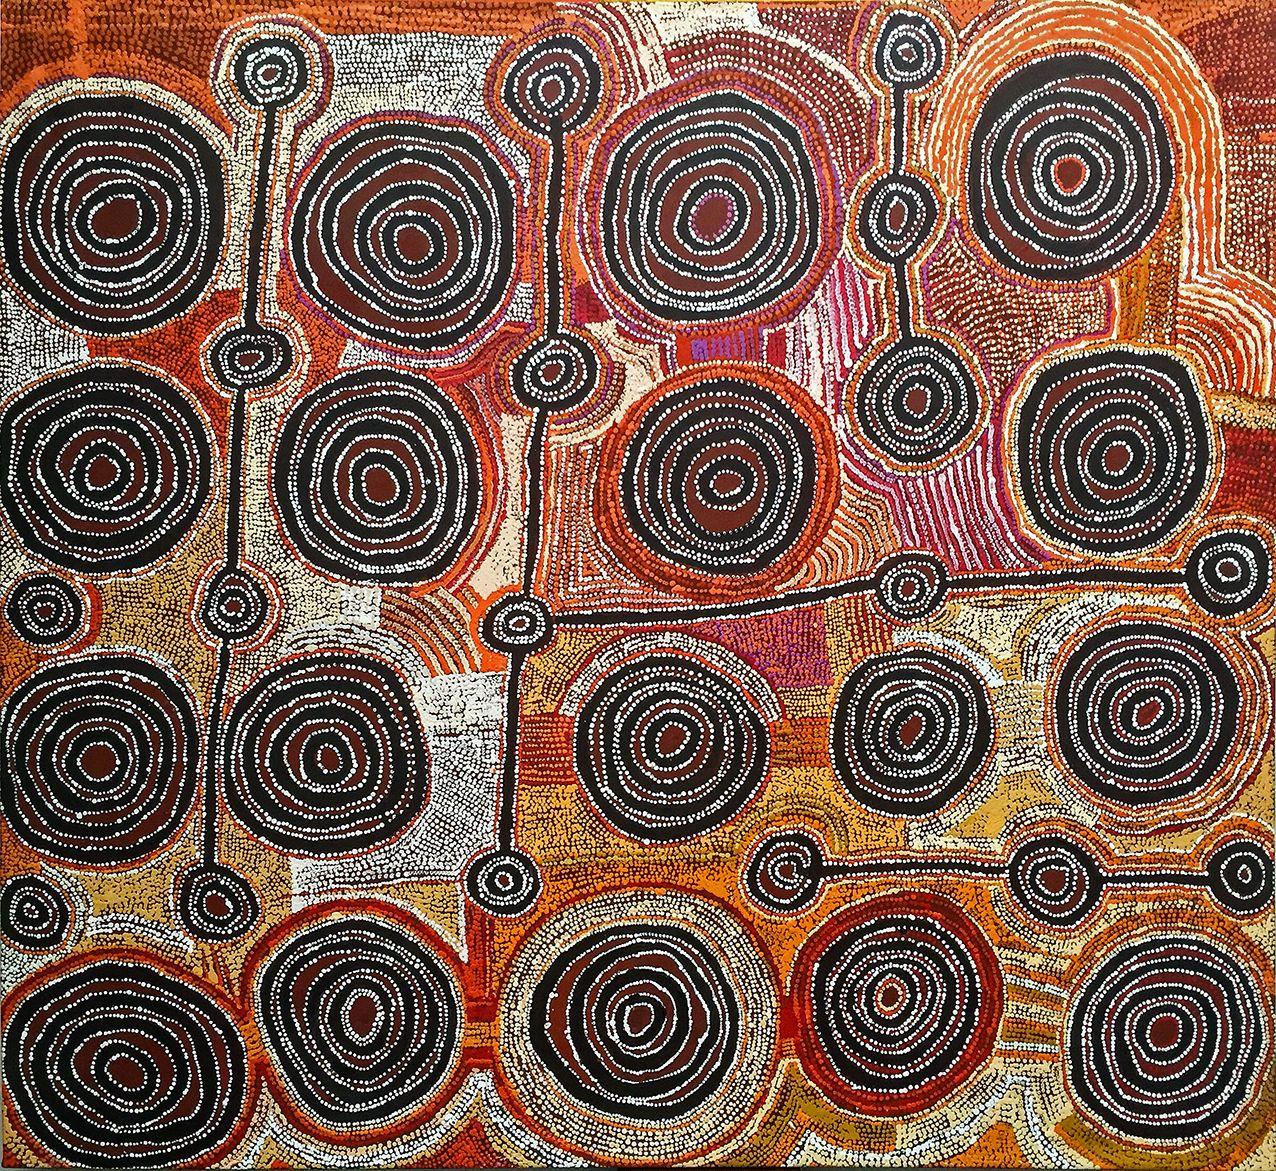 Artiste : Taylor Cooper. Titre : Malara - Wanakpi tjukurpa Dreaming Time story 2017. Provenance : Kaltjiti Arts, APY lands, Australie. 198 x 183 cm © Aboriginal Signature • Estrangin gallery, avec l'autorisation de l'artiste et du Kaltjiti Arts Centre